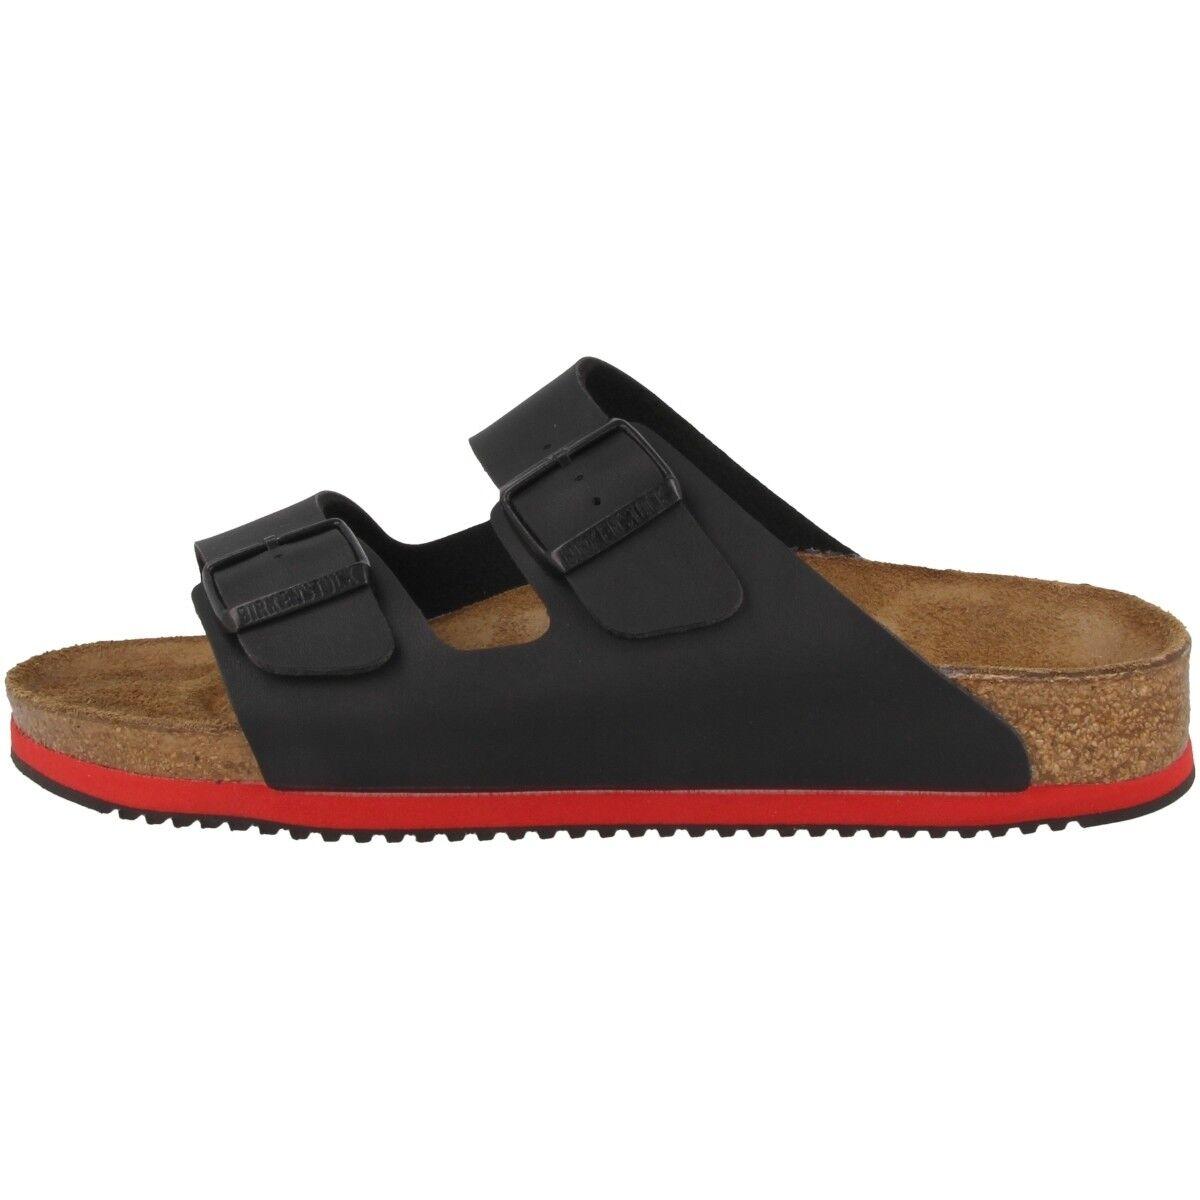 Birkenstock Arizona SL Birko-Flor Sandalen Schuhe Clog black 230116 Weite schmal